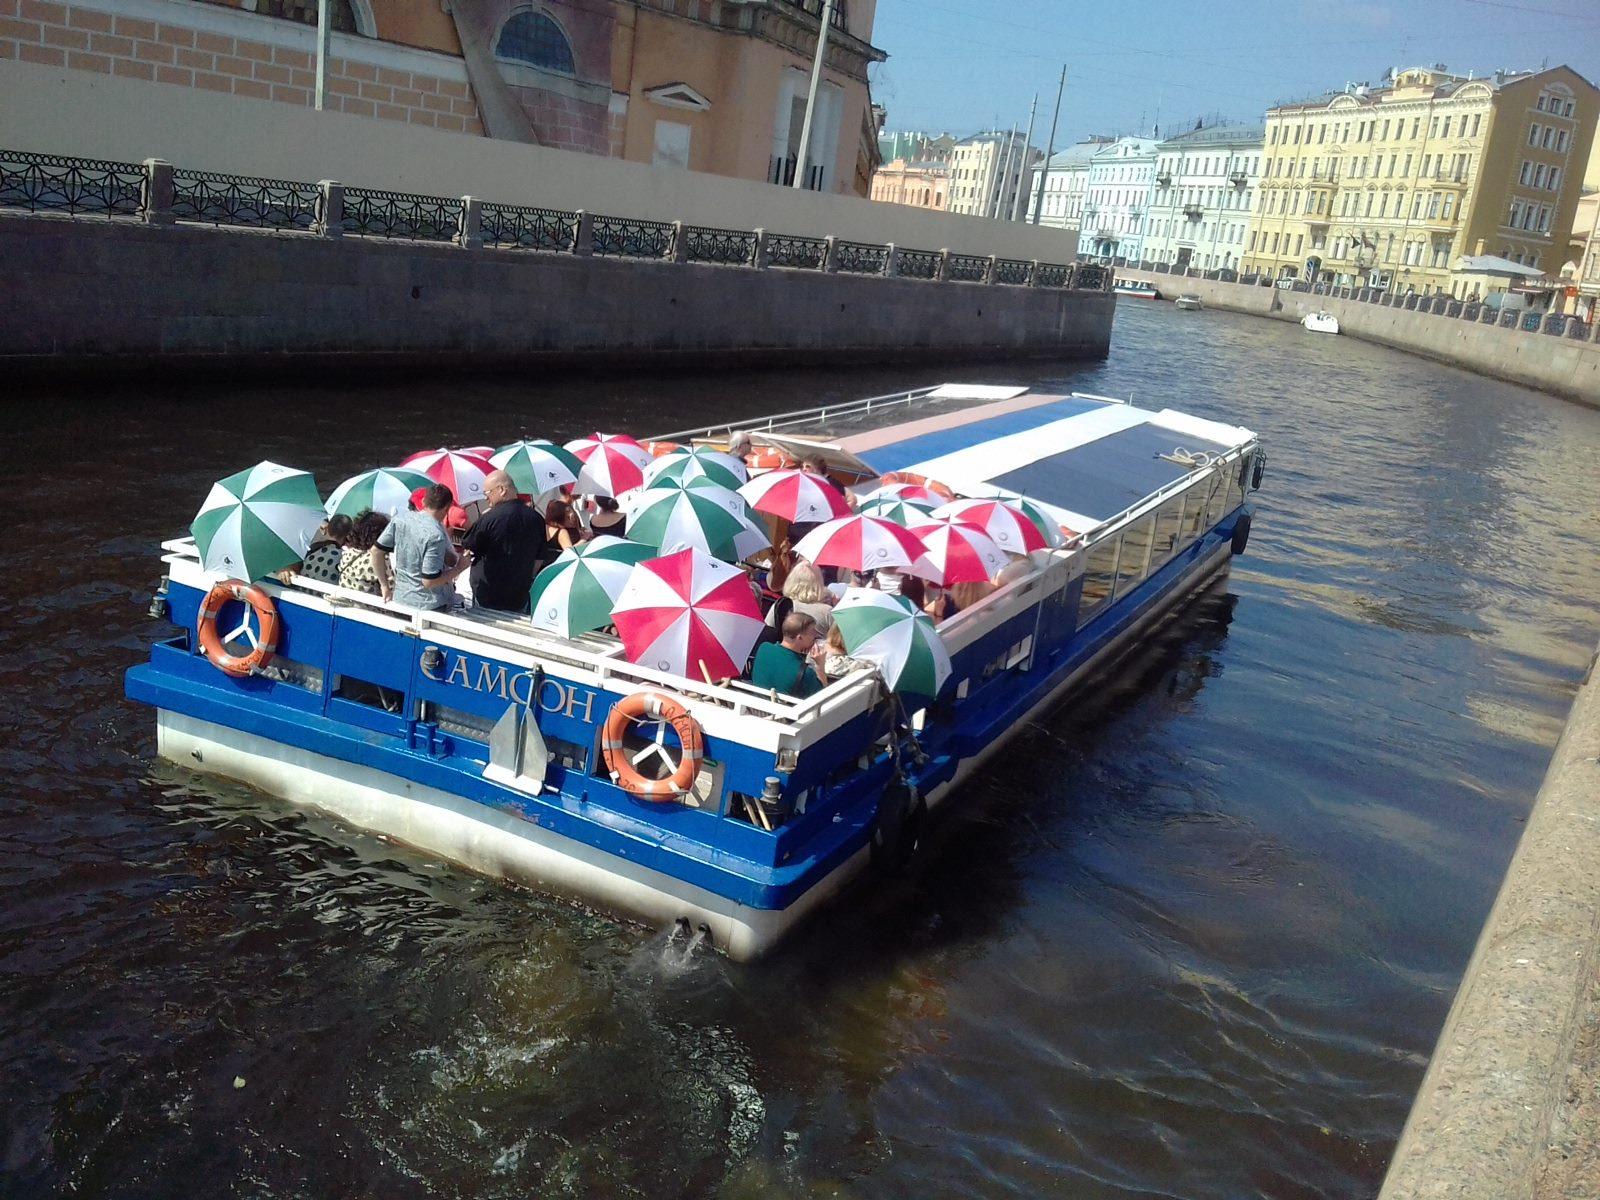 Прогулка на теплоходе по каналам Санкт-Петербурга с участиками фестиваля